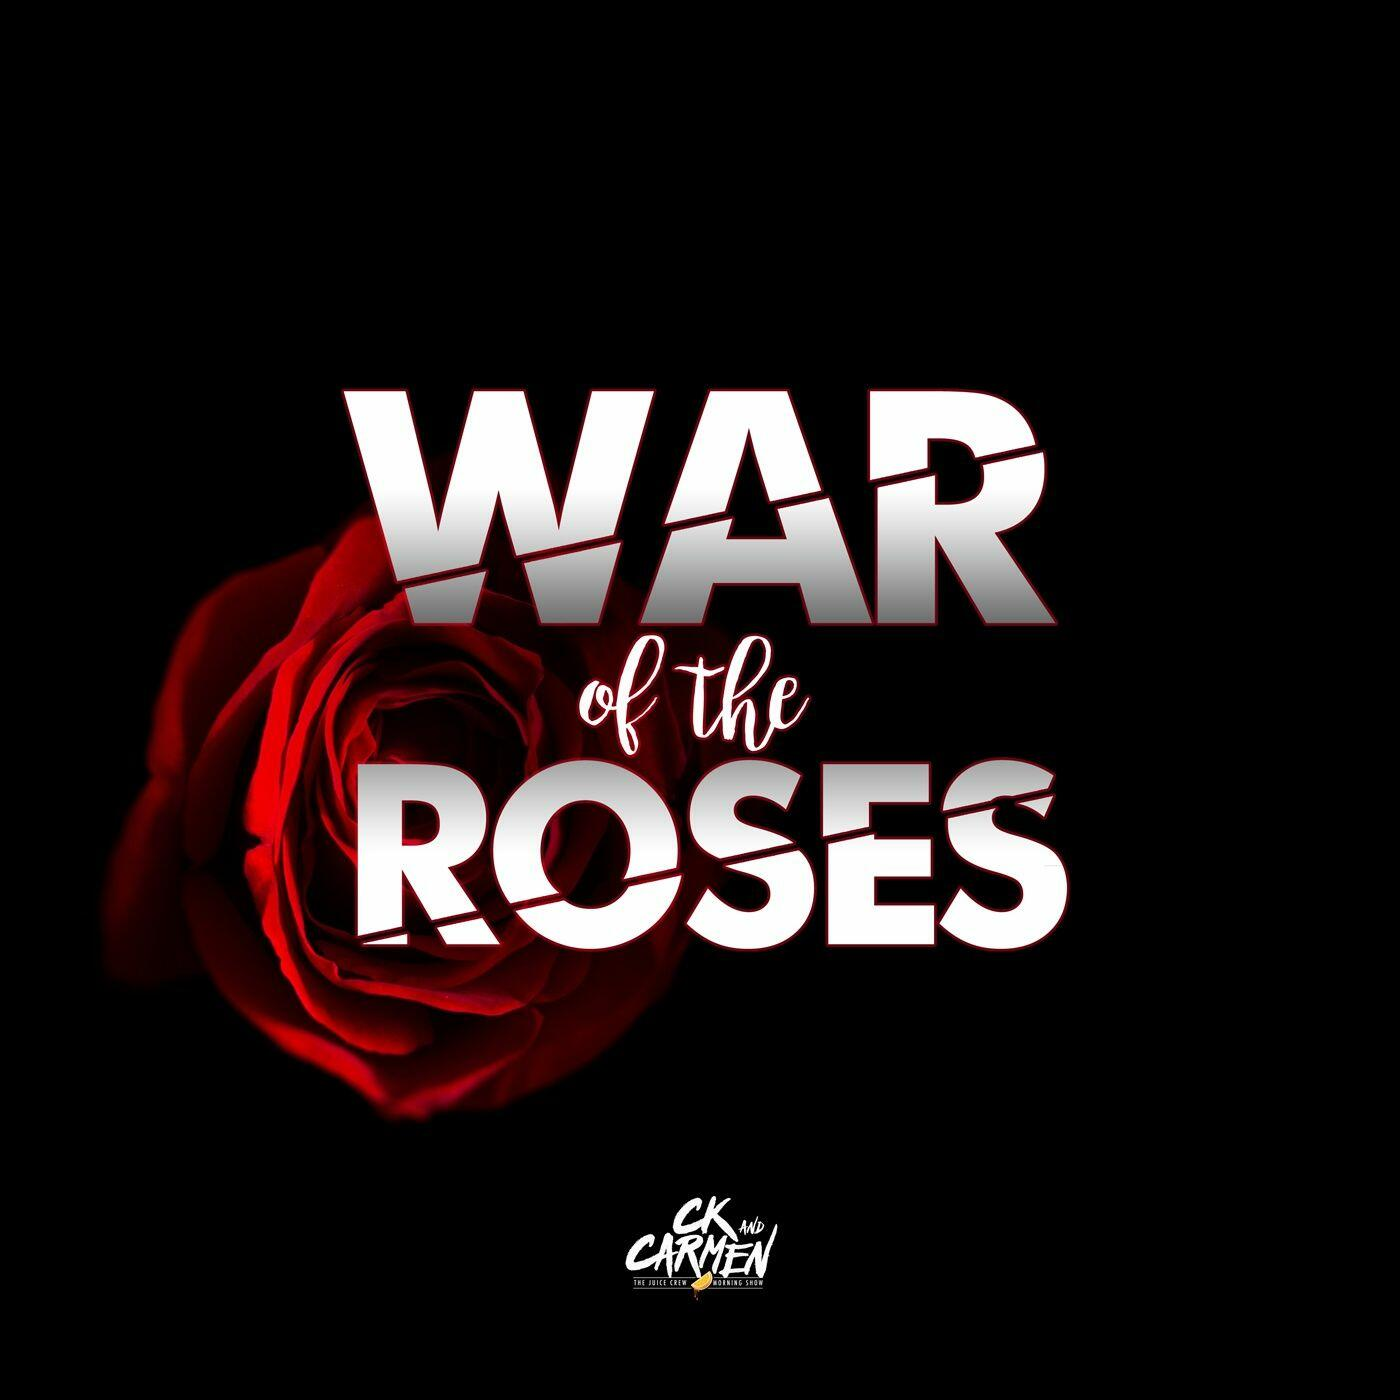 CK & Carmen: War of the Roses